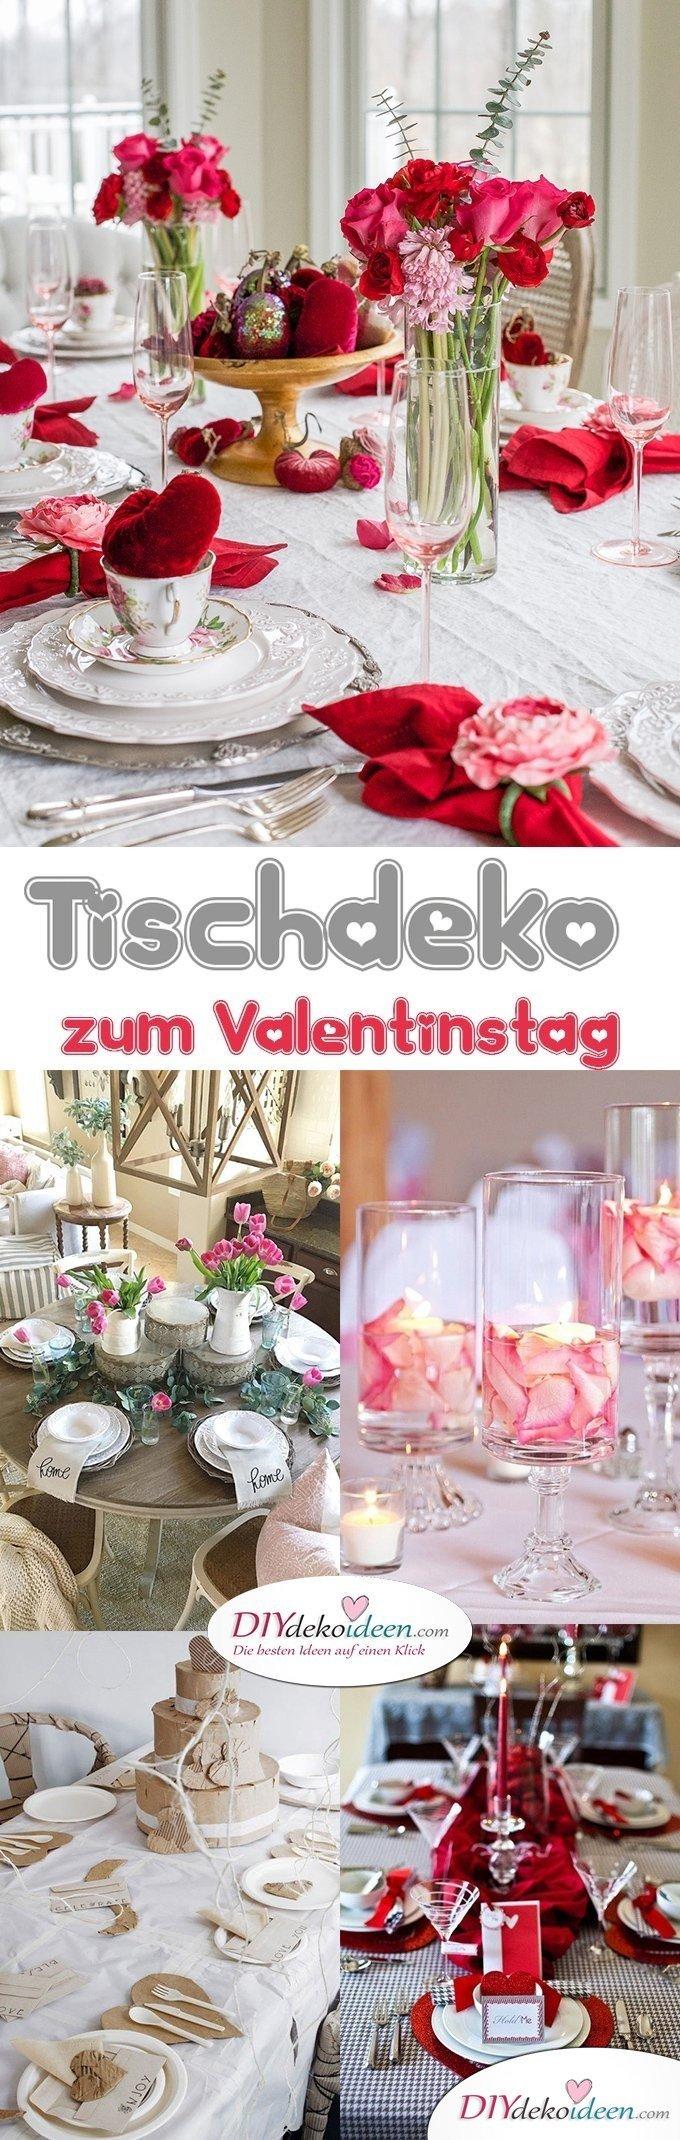 Tischdeko zum Valentinstag, Tisch Deko Ideen, Blumendeko, Valentinstag Deko Ideen, Deko Valentinstag, dekorieren, DIY Dekoideen, Deko basteln, romantische Deko,